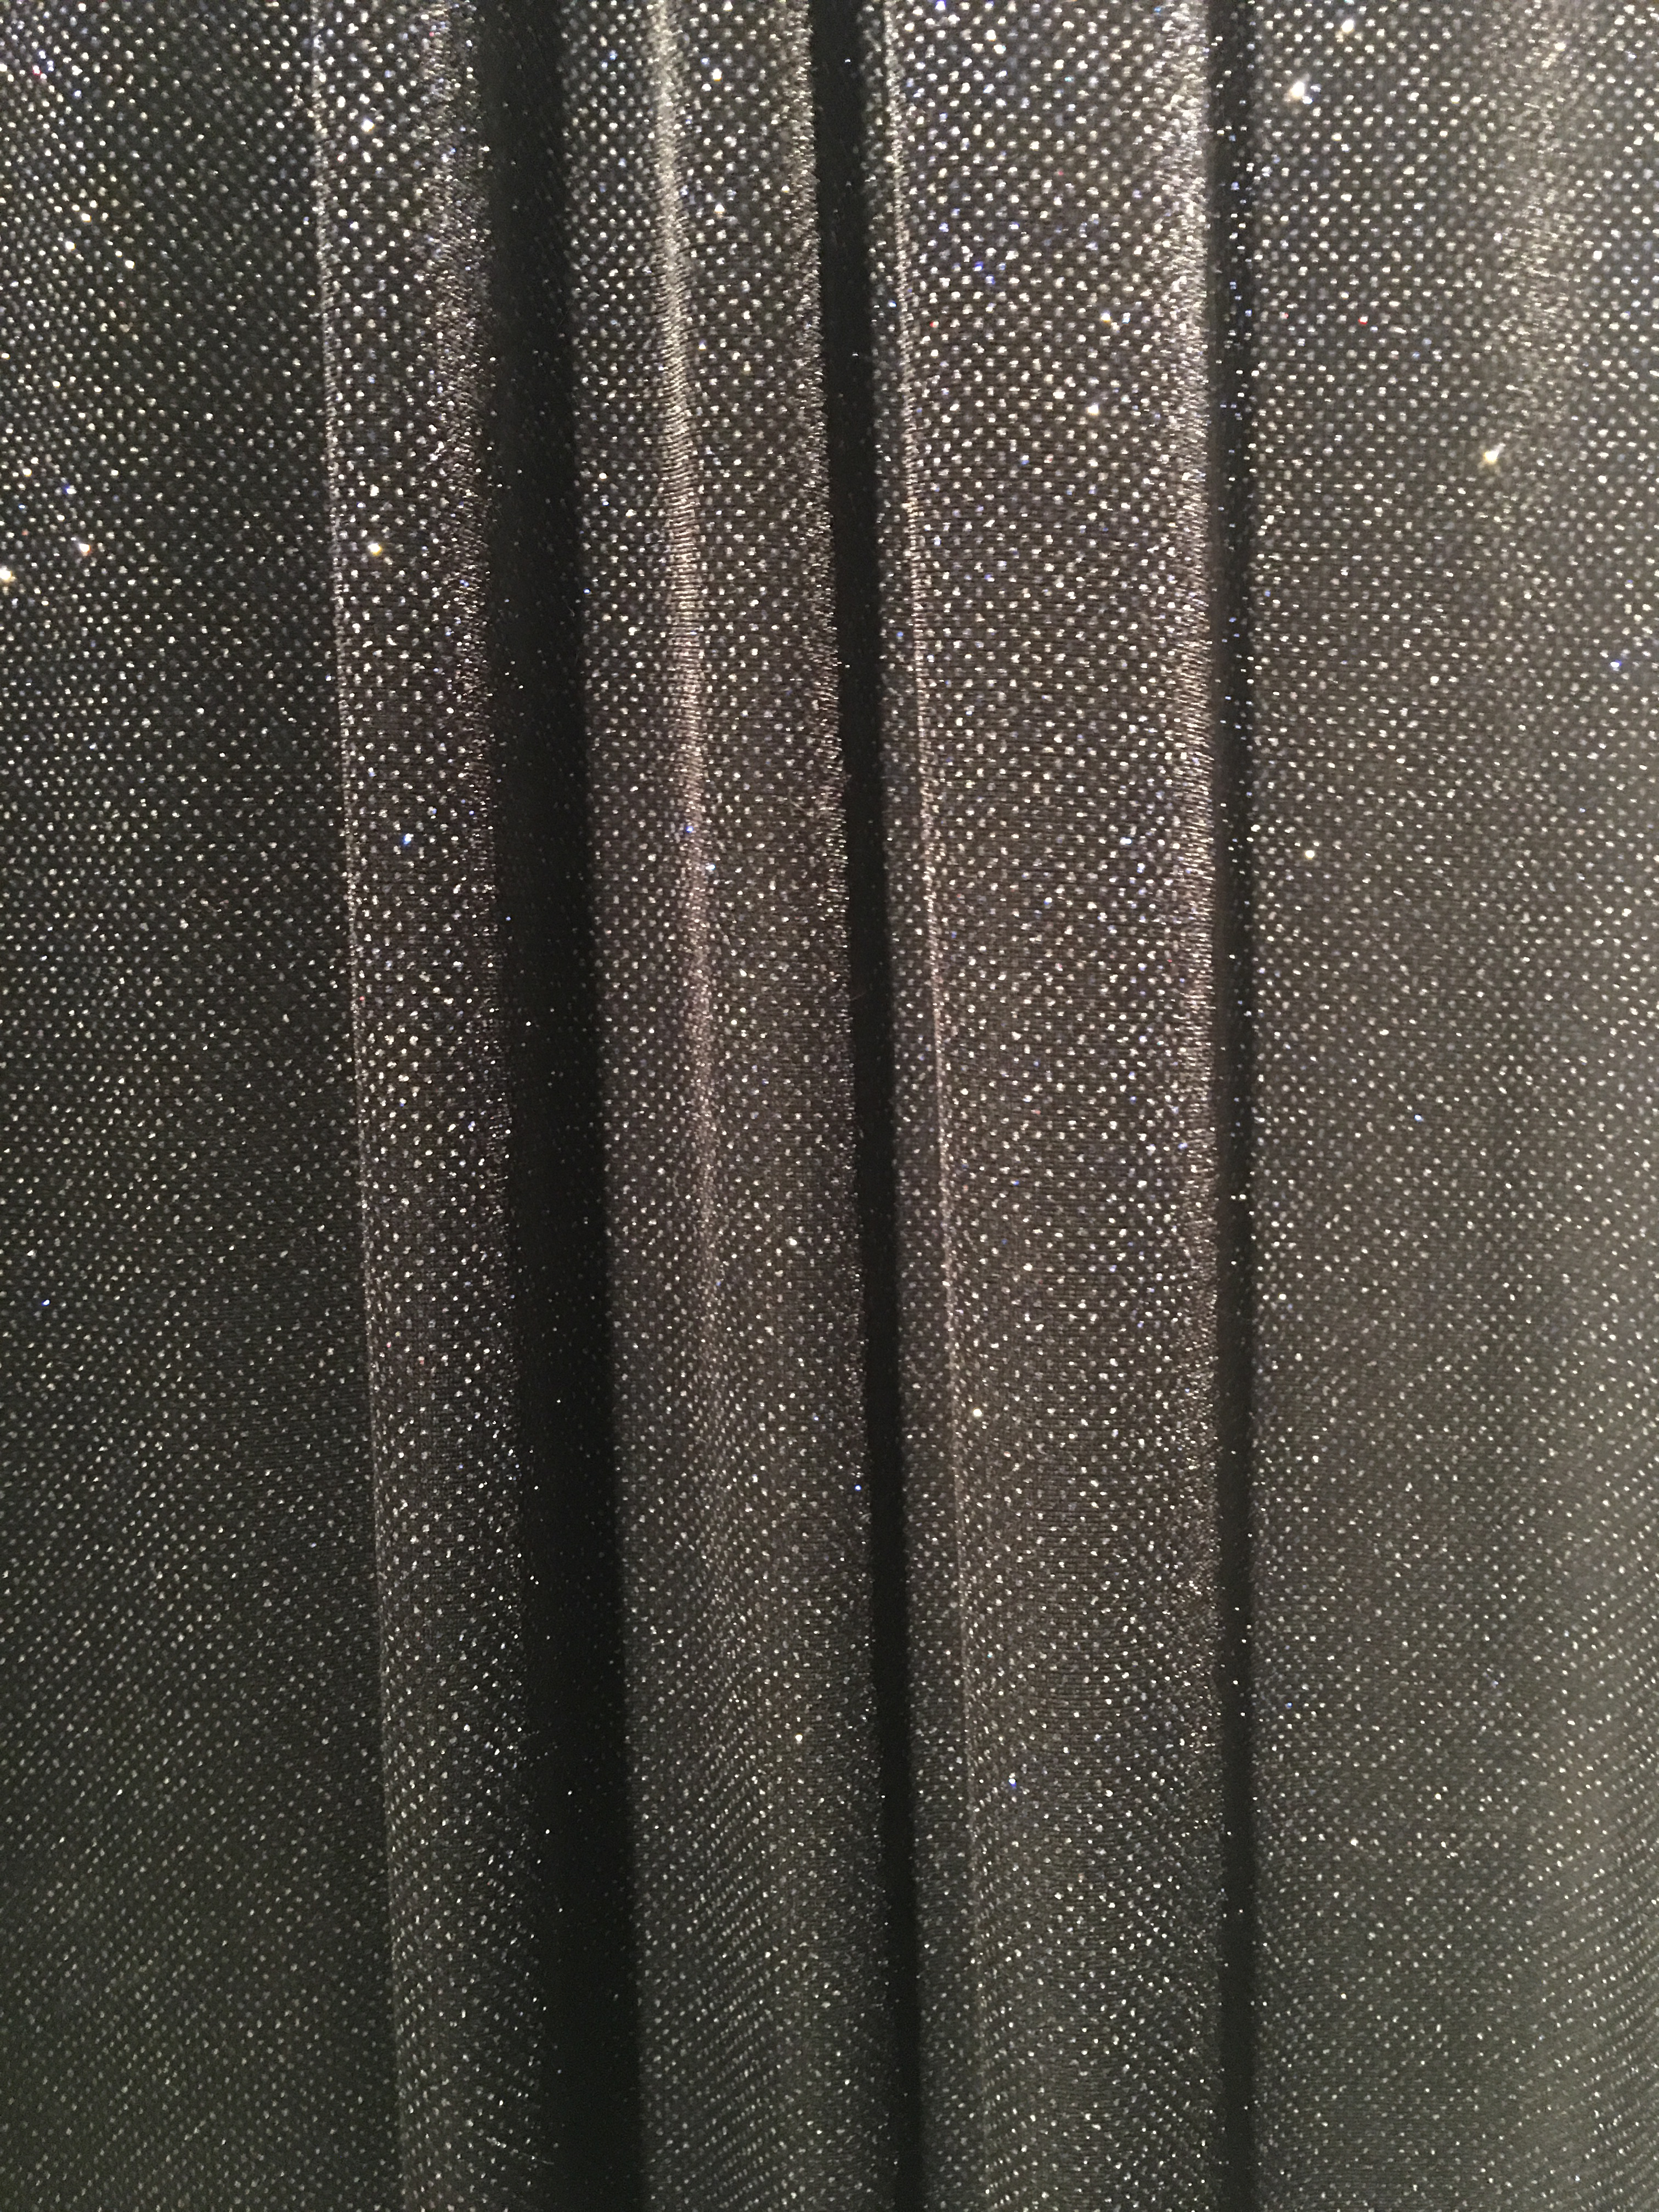 Black Small Reflective Sequin